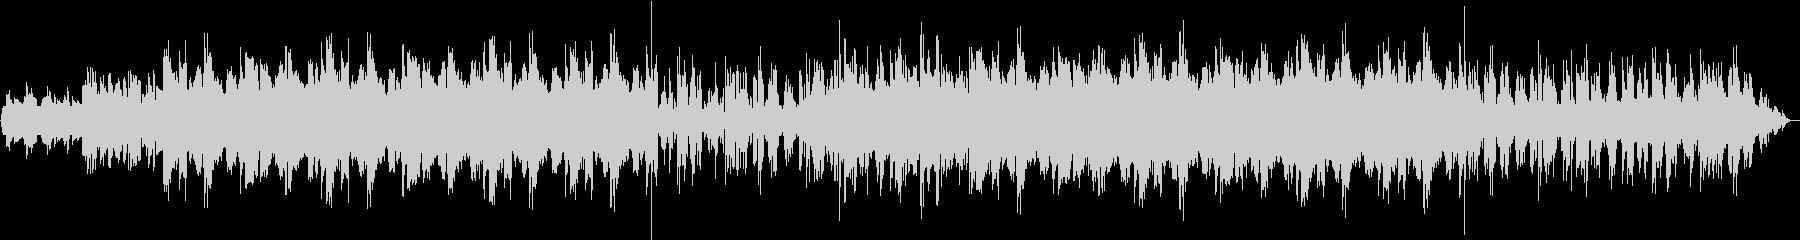 120bpm、F#-min、エレピ曲の未再生の波形